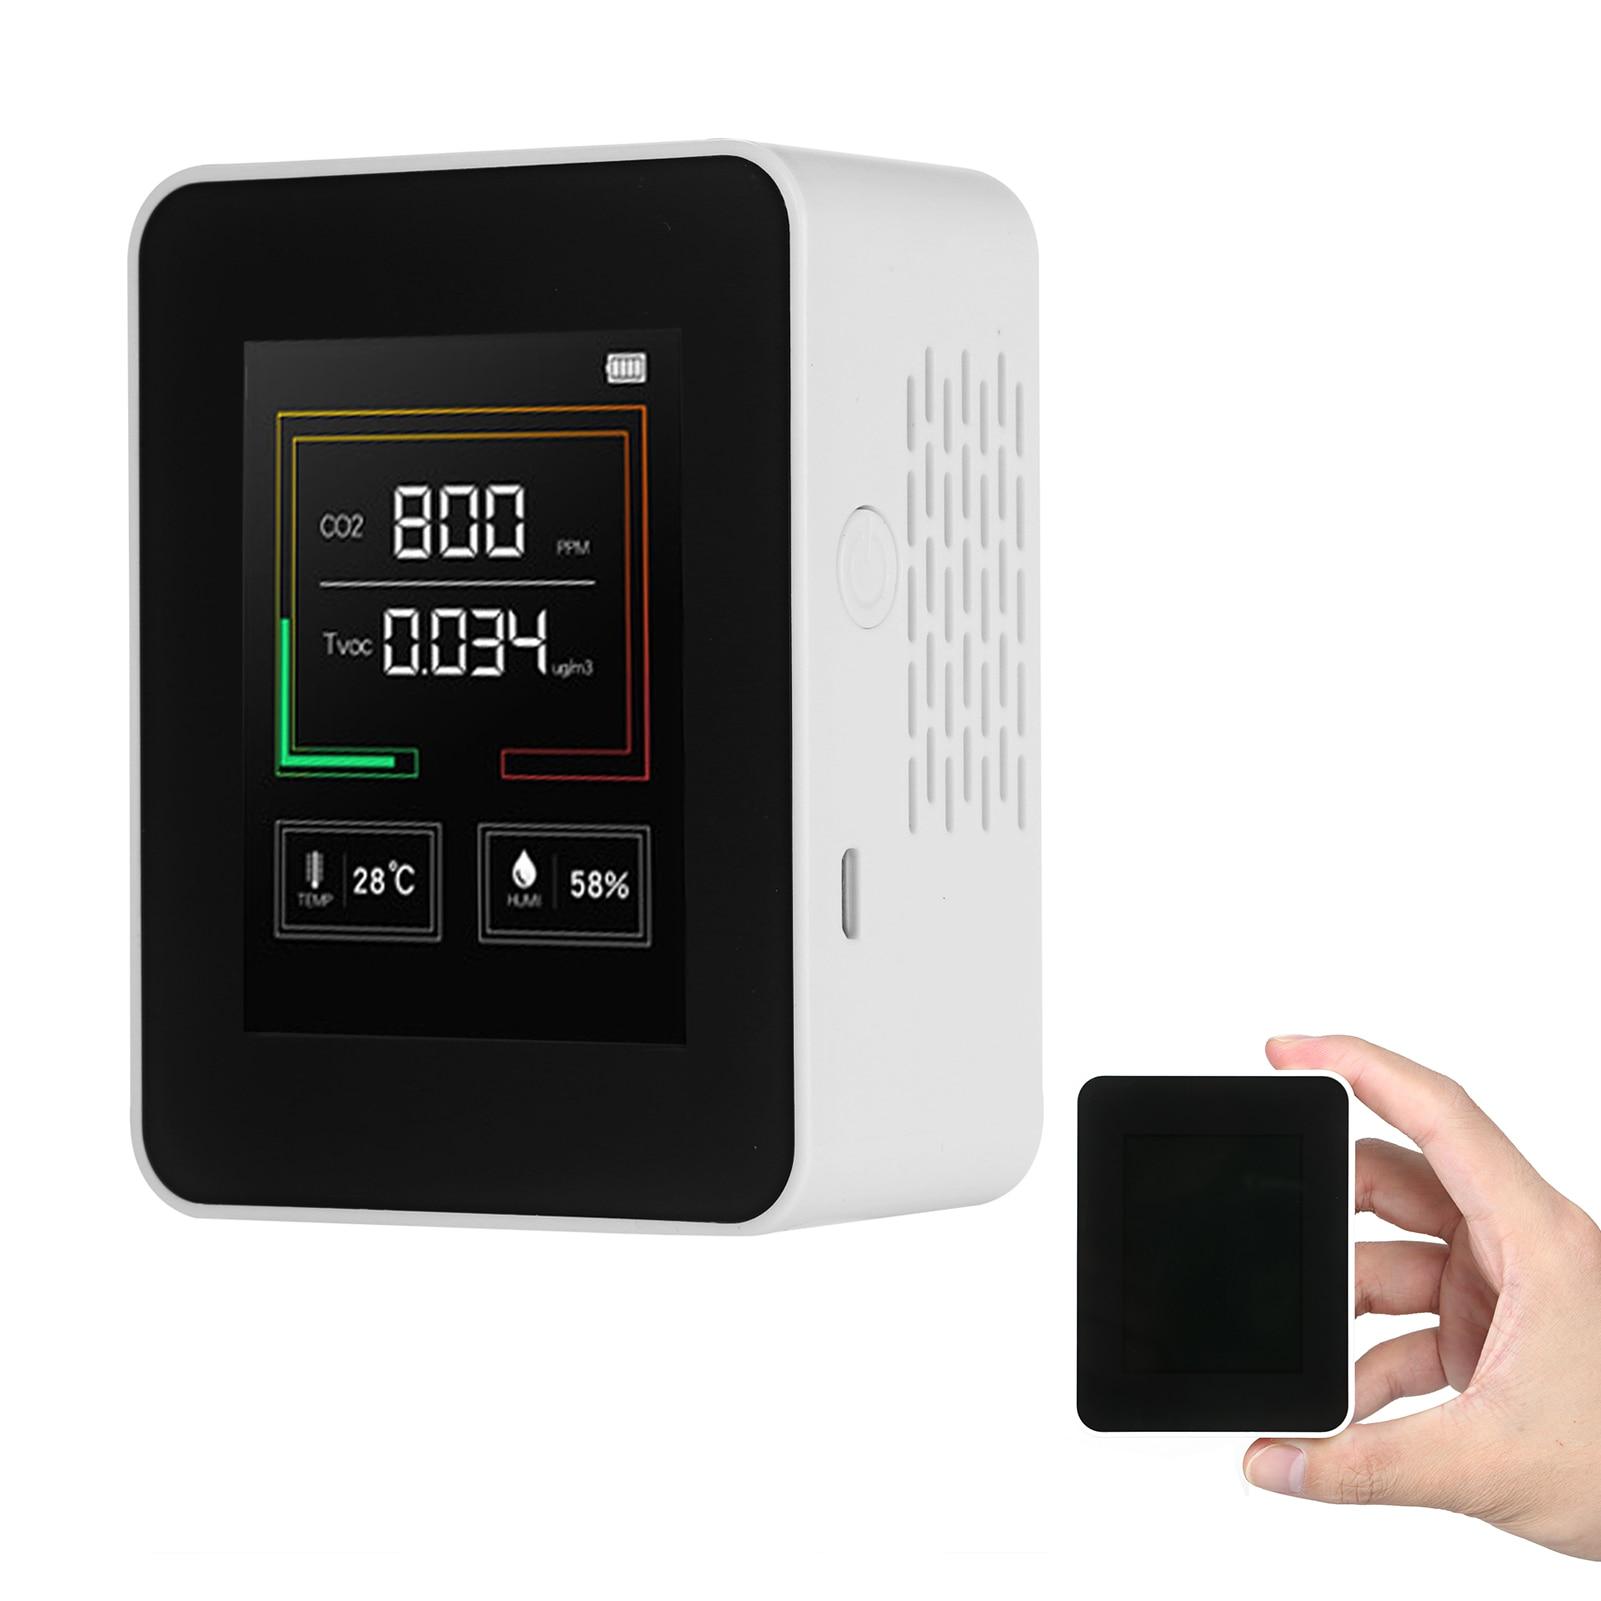 Gas Detector Co2 Meter With Alarm Tvoc Sensor Air Quality Monitor Temperature Humidity Tester Lcd Display Co2 Sensor Meter